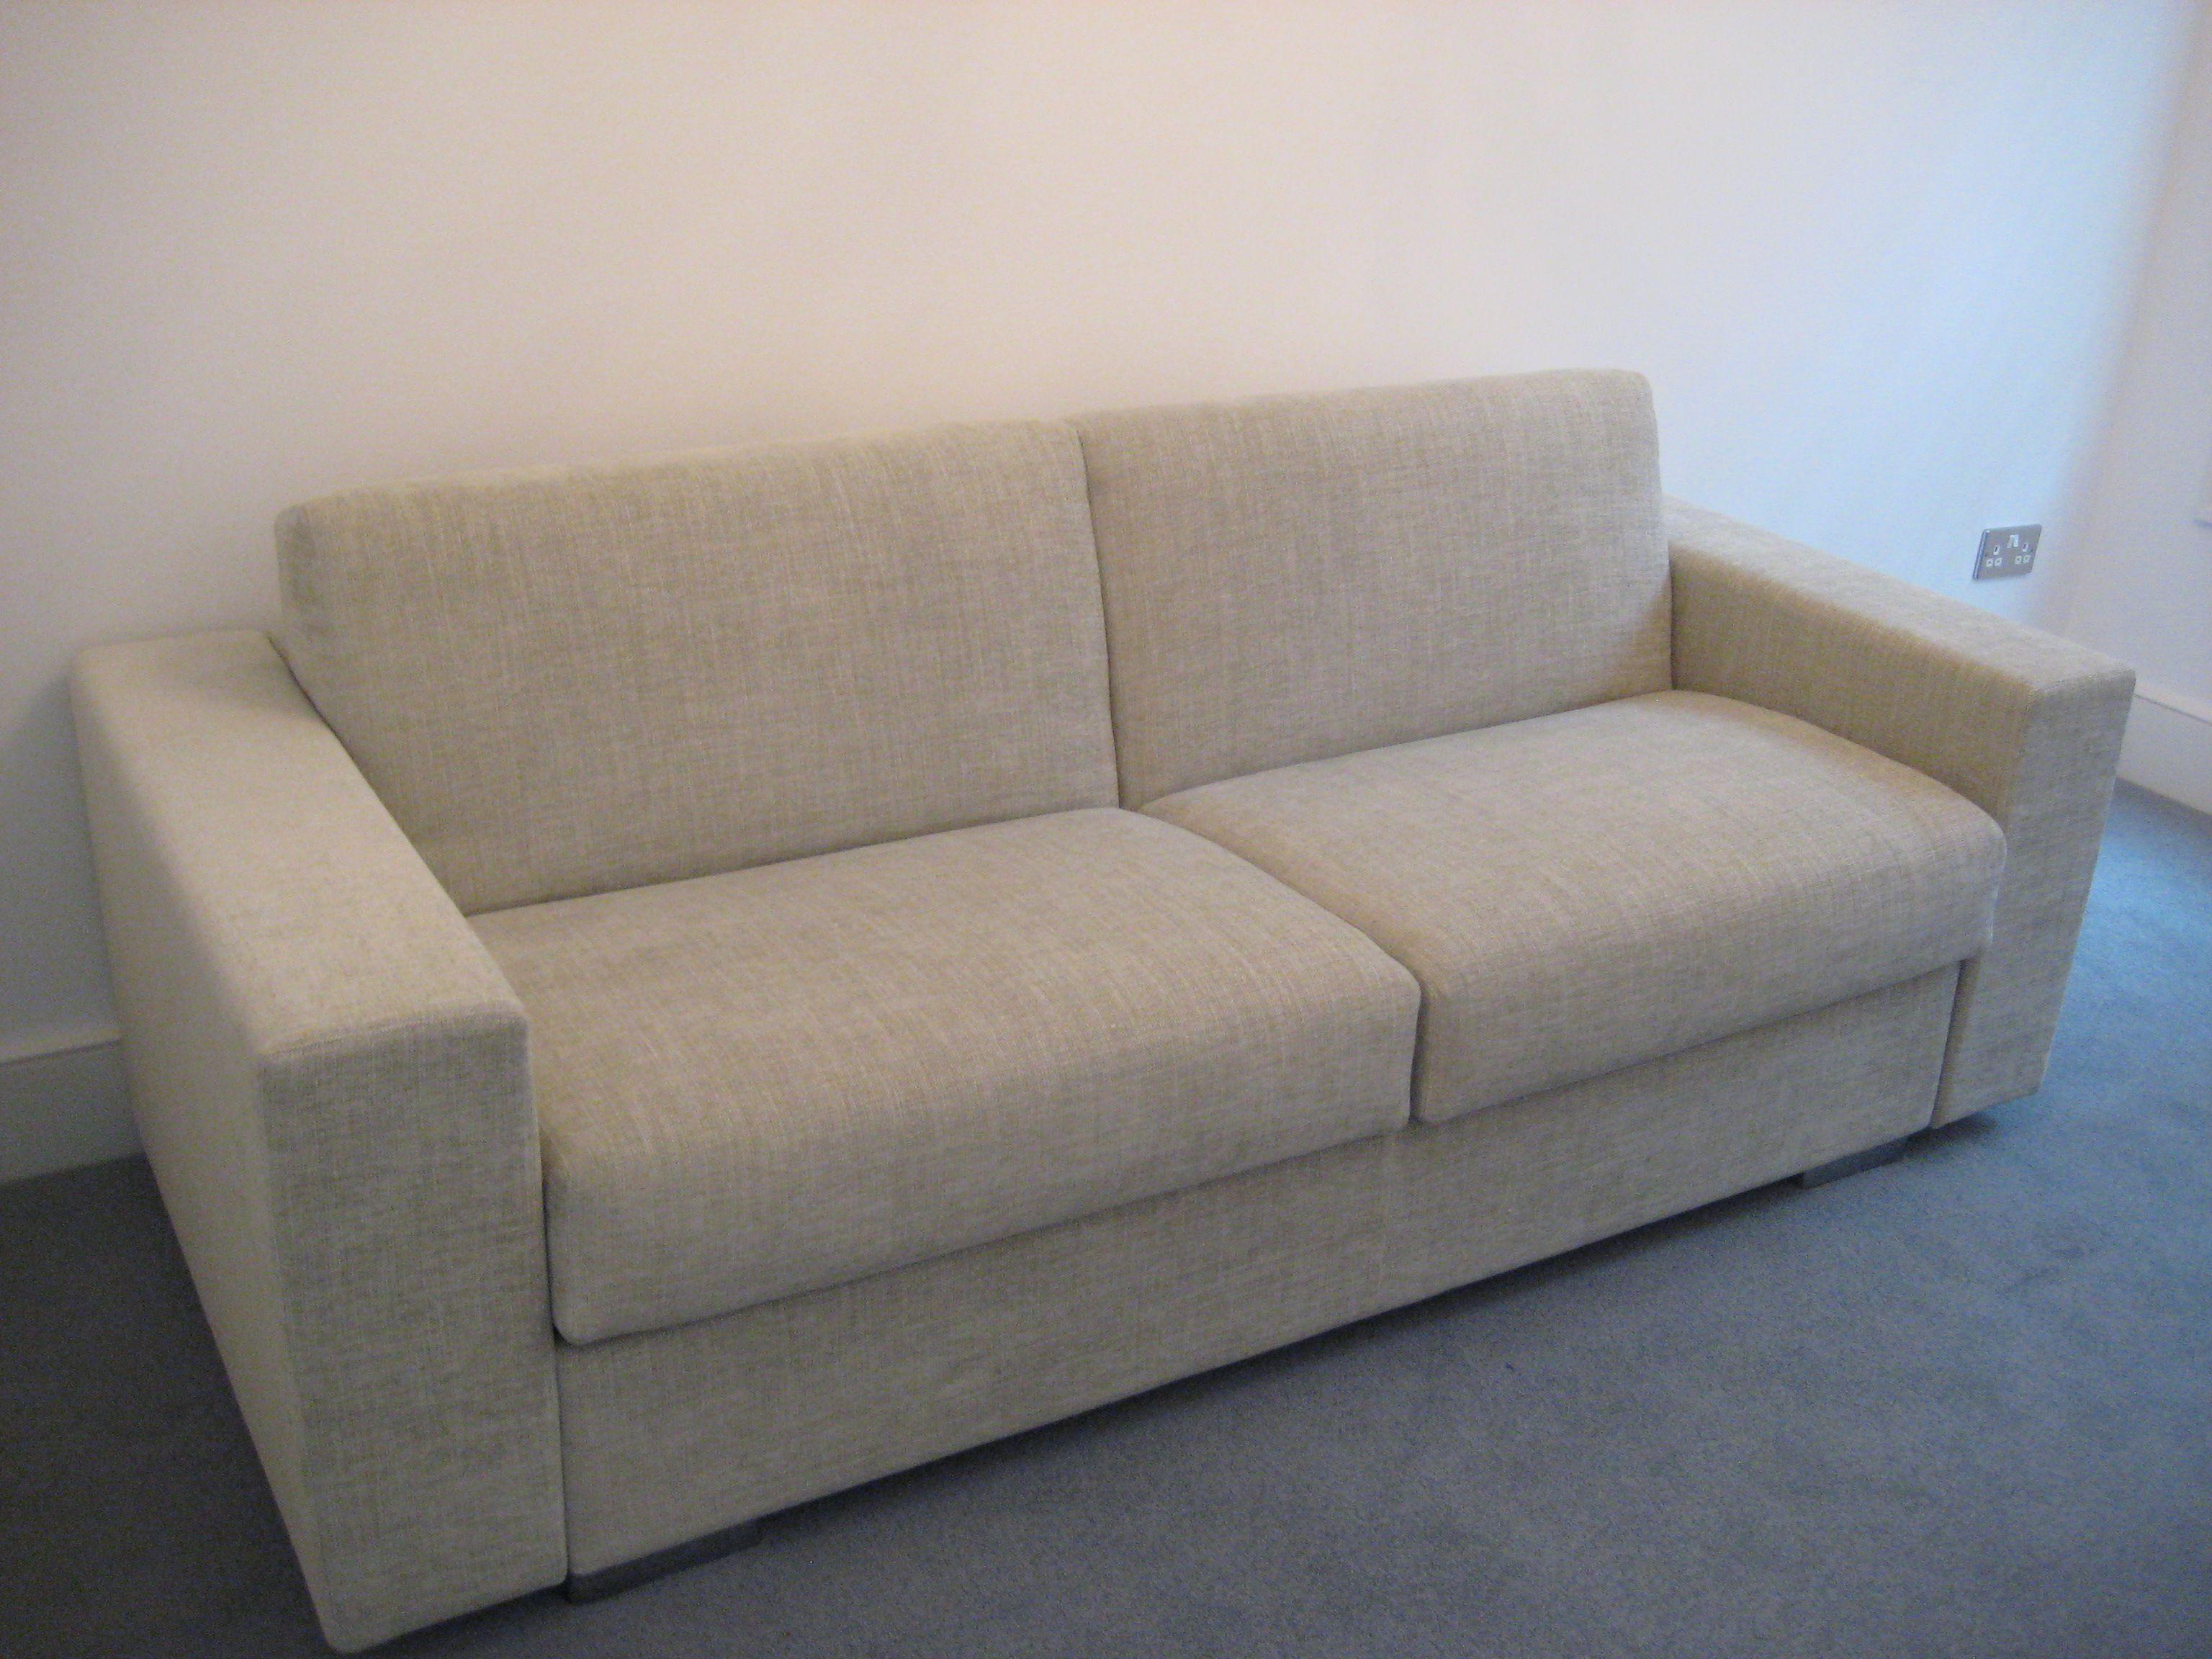 The Range Sofa Beds Part - 27: 54 Best Ash - Regular Use Sofa Bed Images On Pinterest | Ranges, Sofa Beds  And Ash